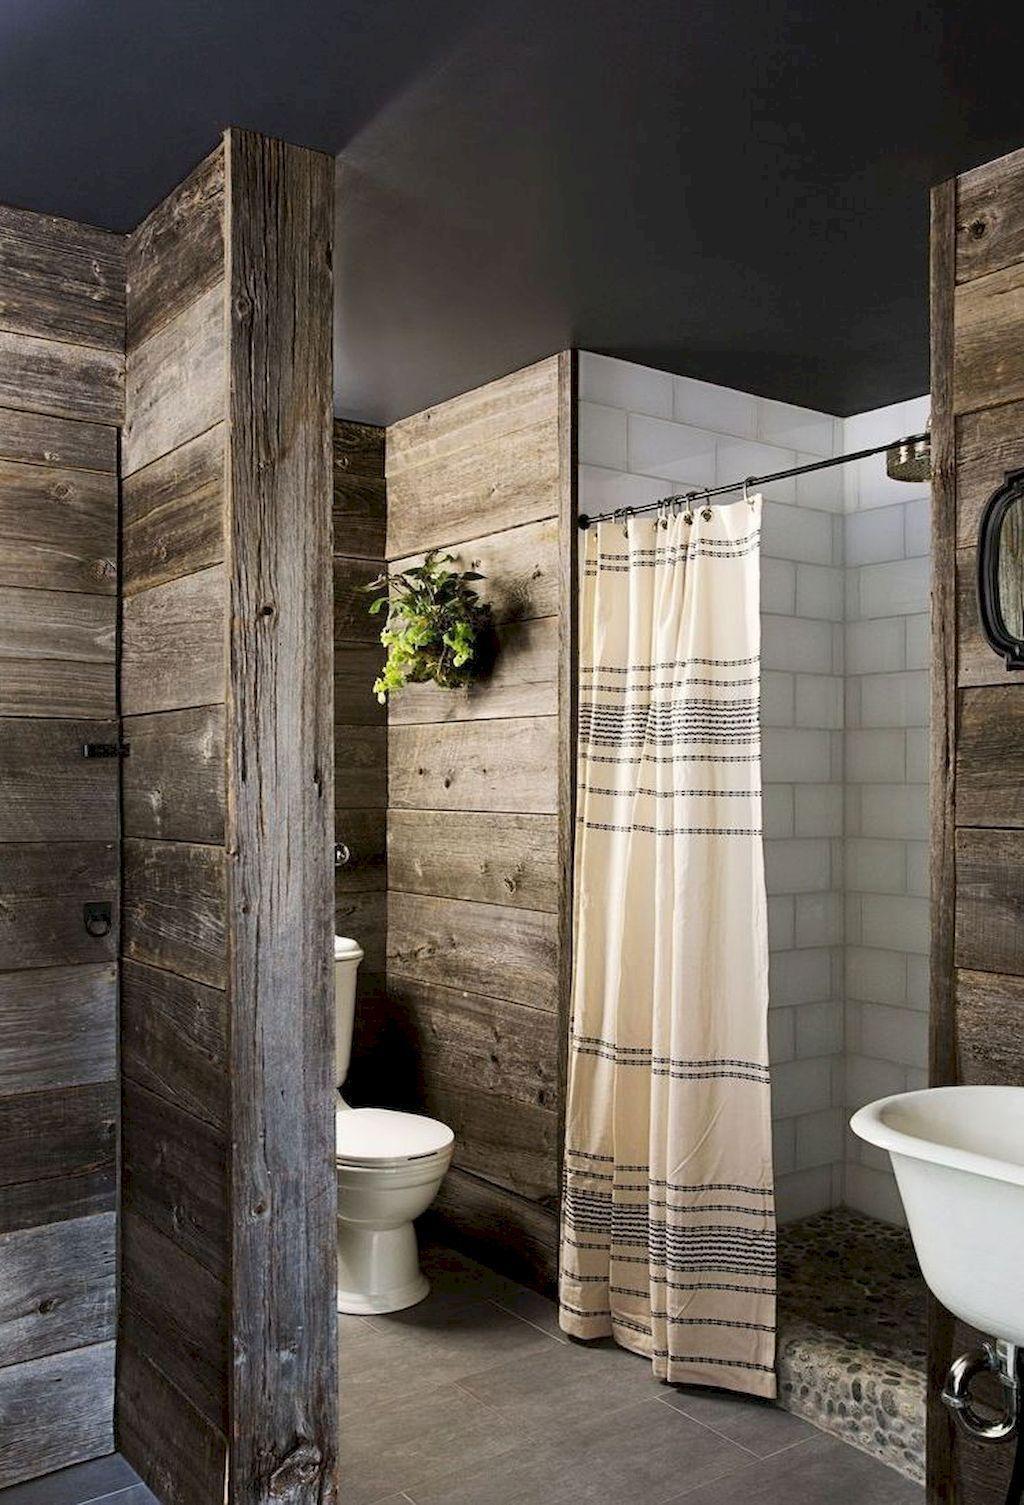 pin by leah willingham on bathroom in 2018 pinterest bathroom rh pinterest com